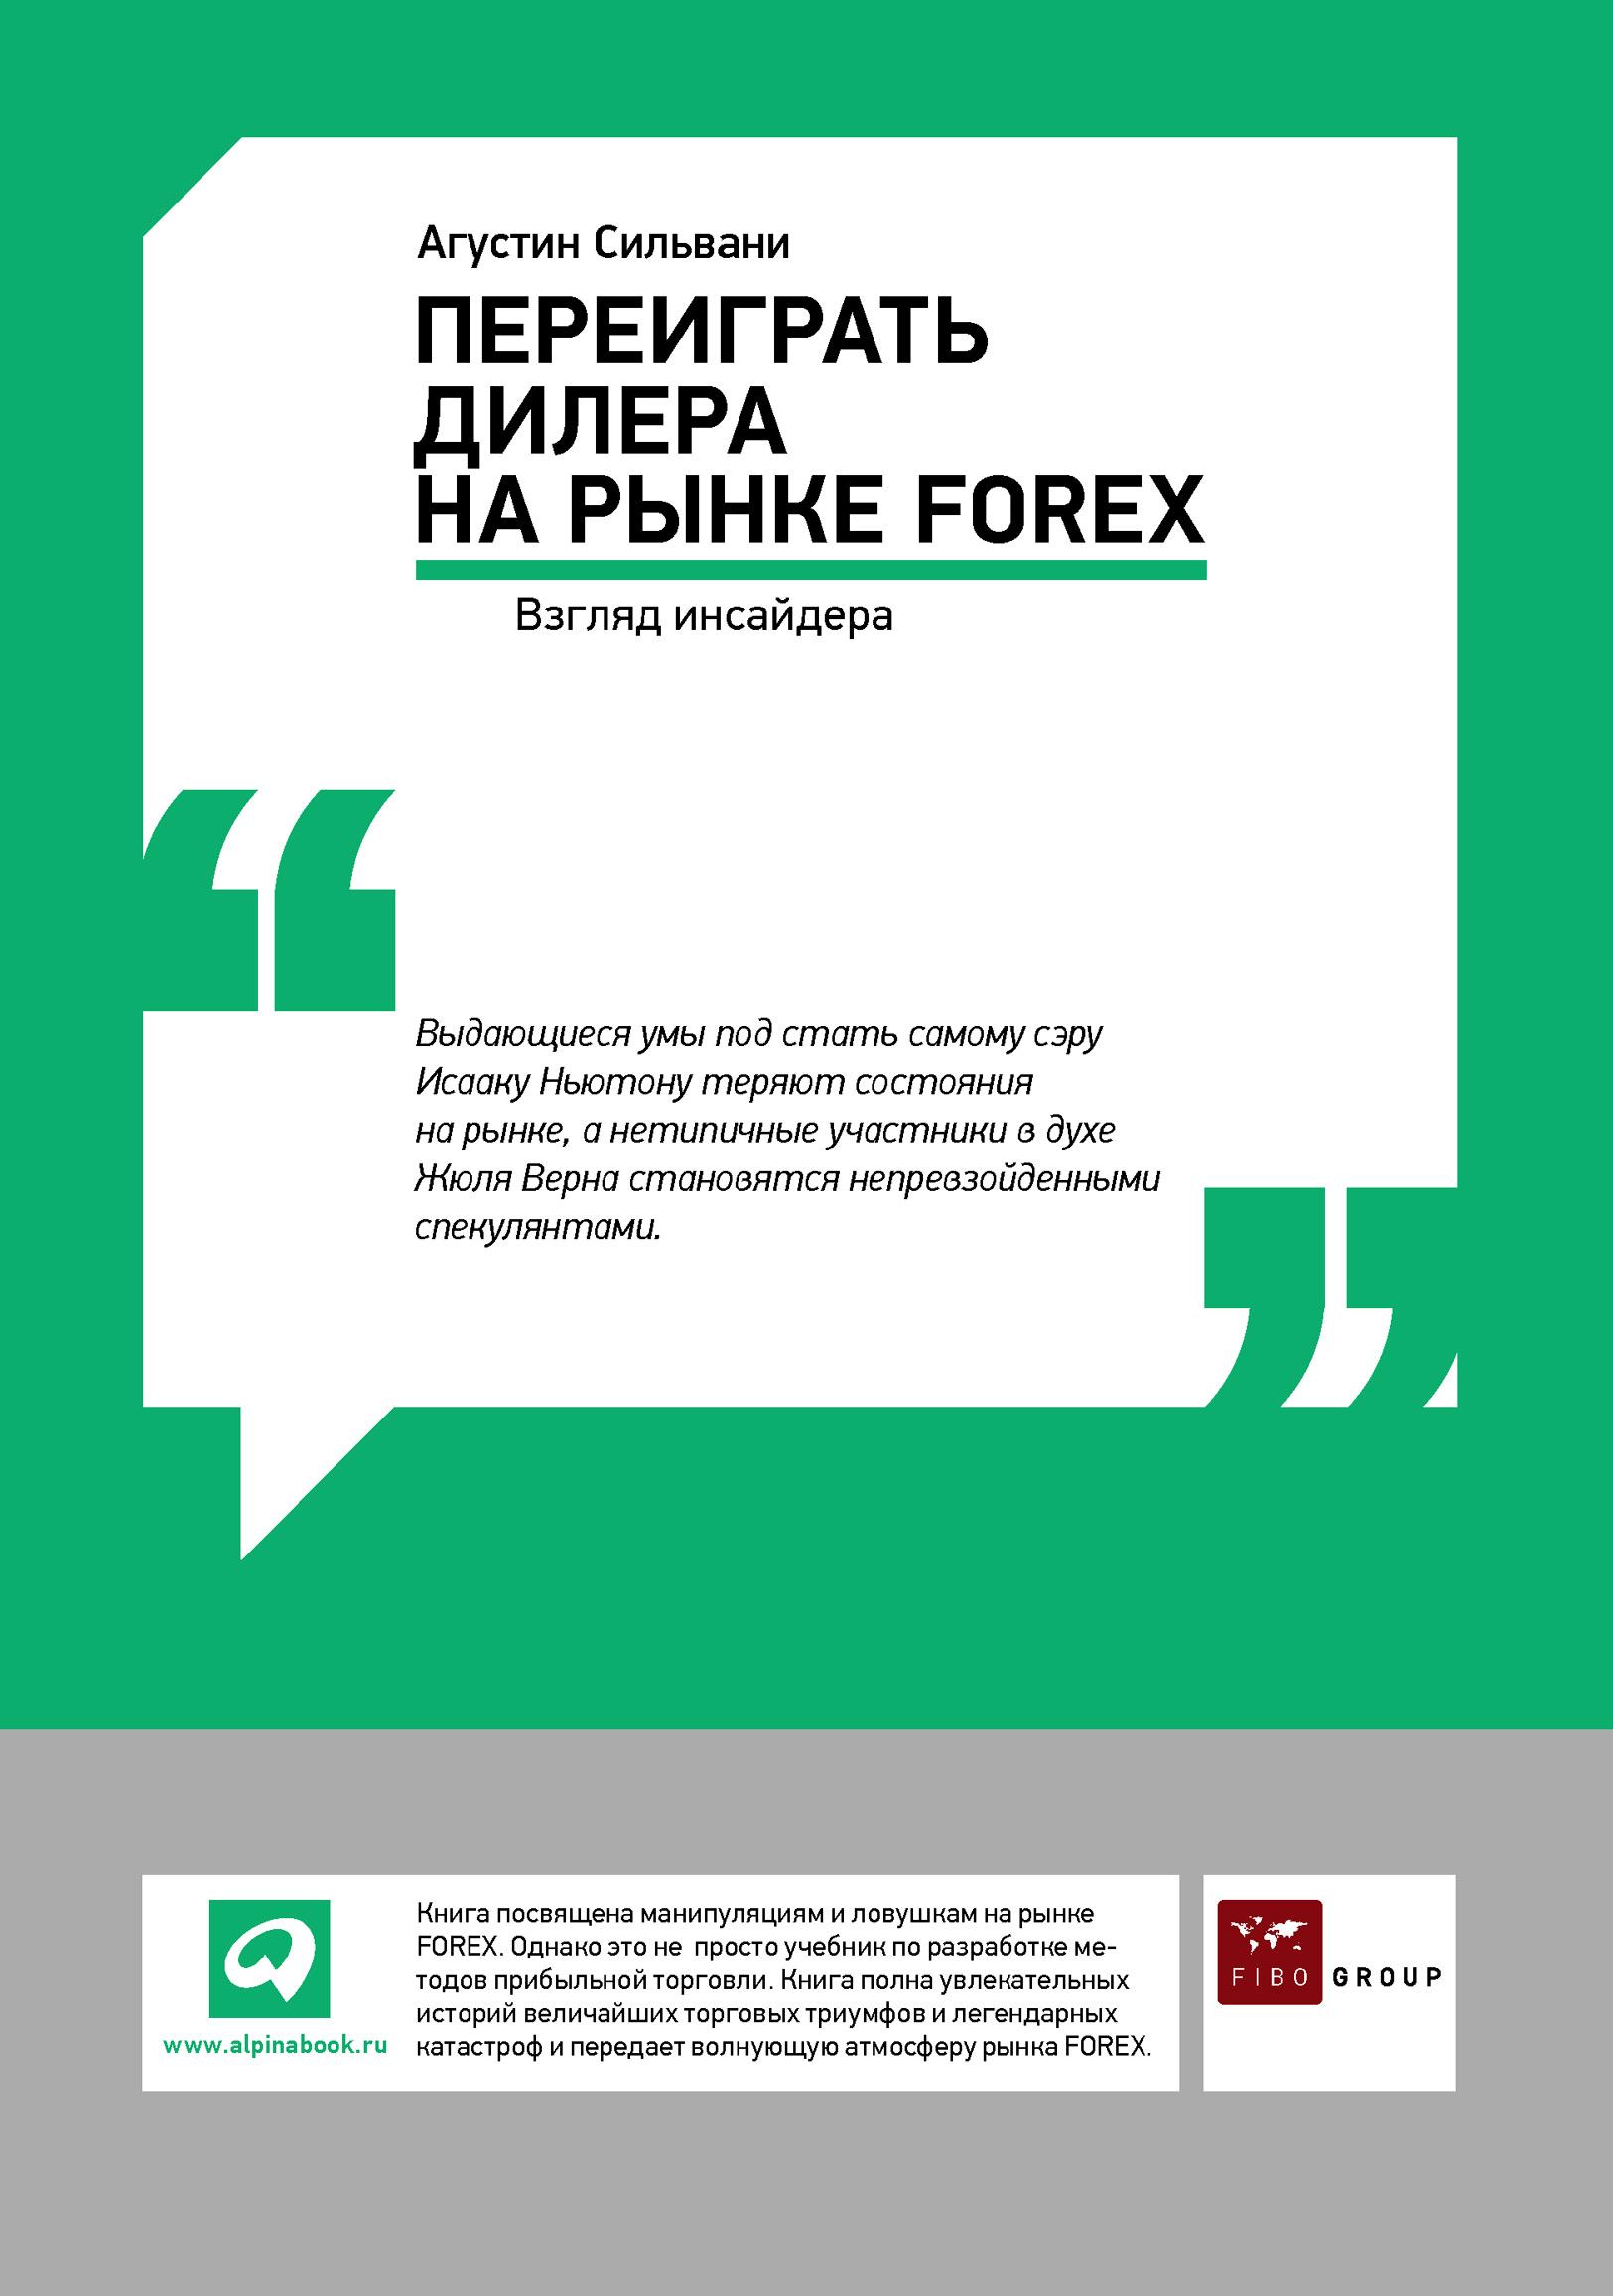 Агстин Сильани Переиграть на рынке FOREX: згляд инсайдера